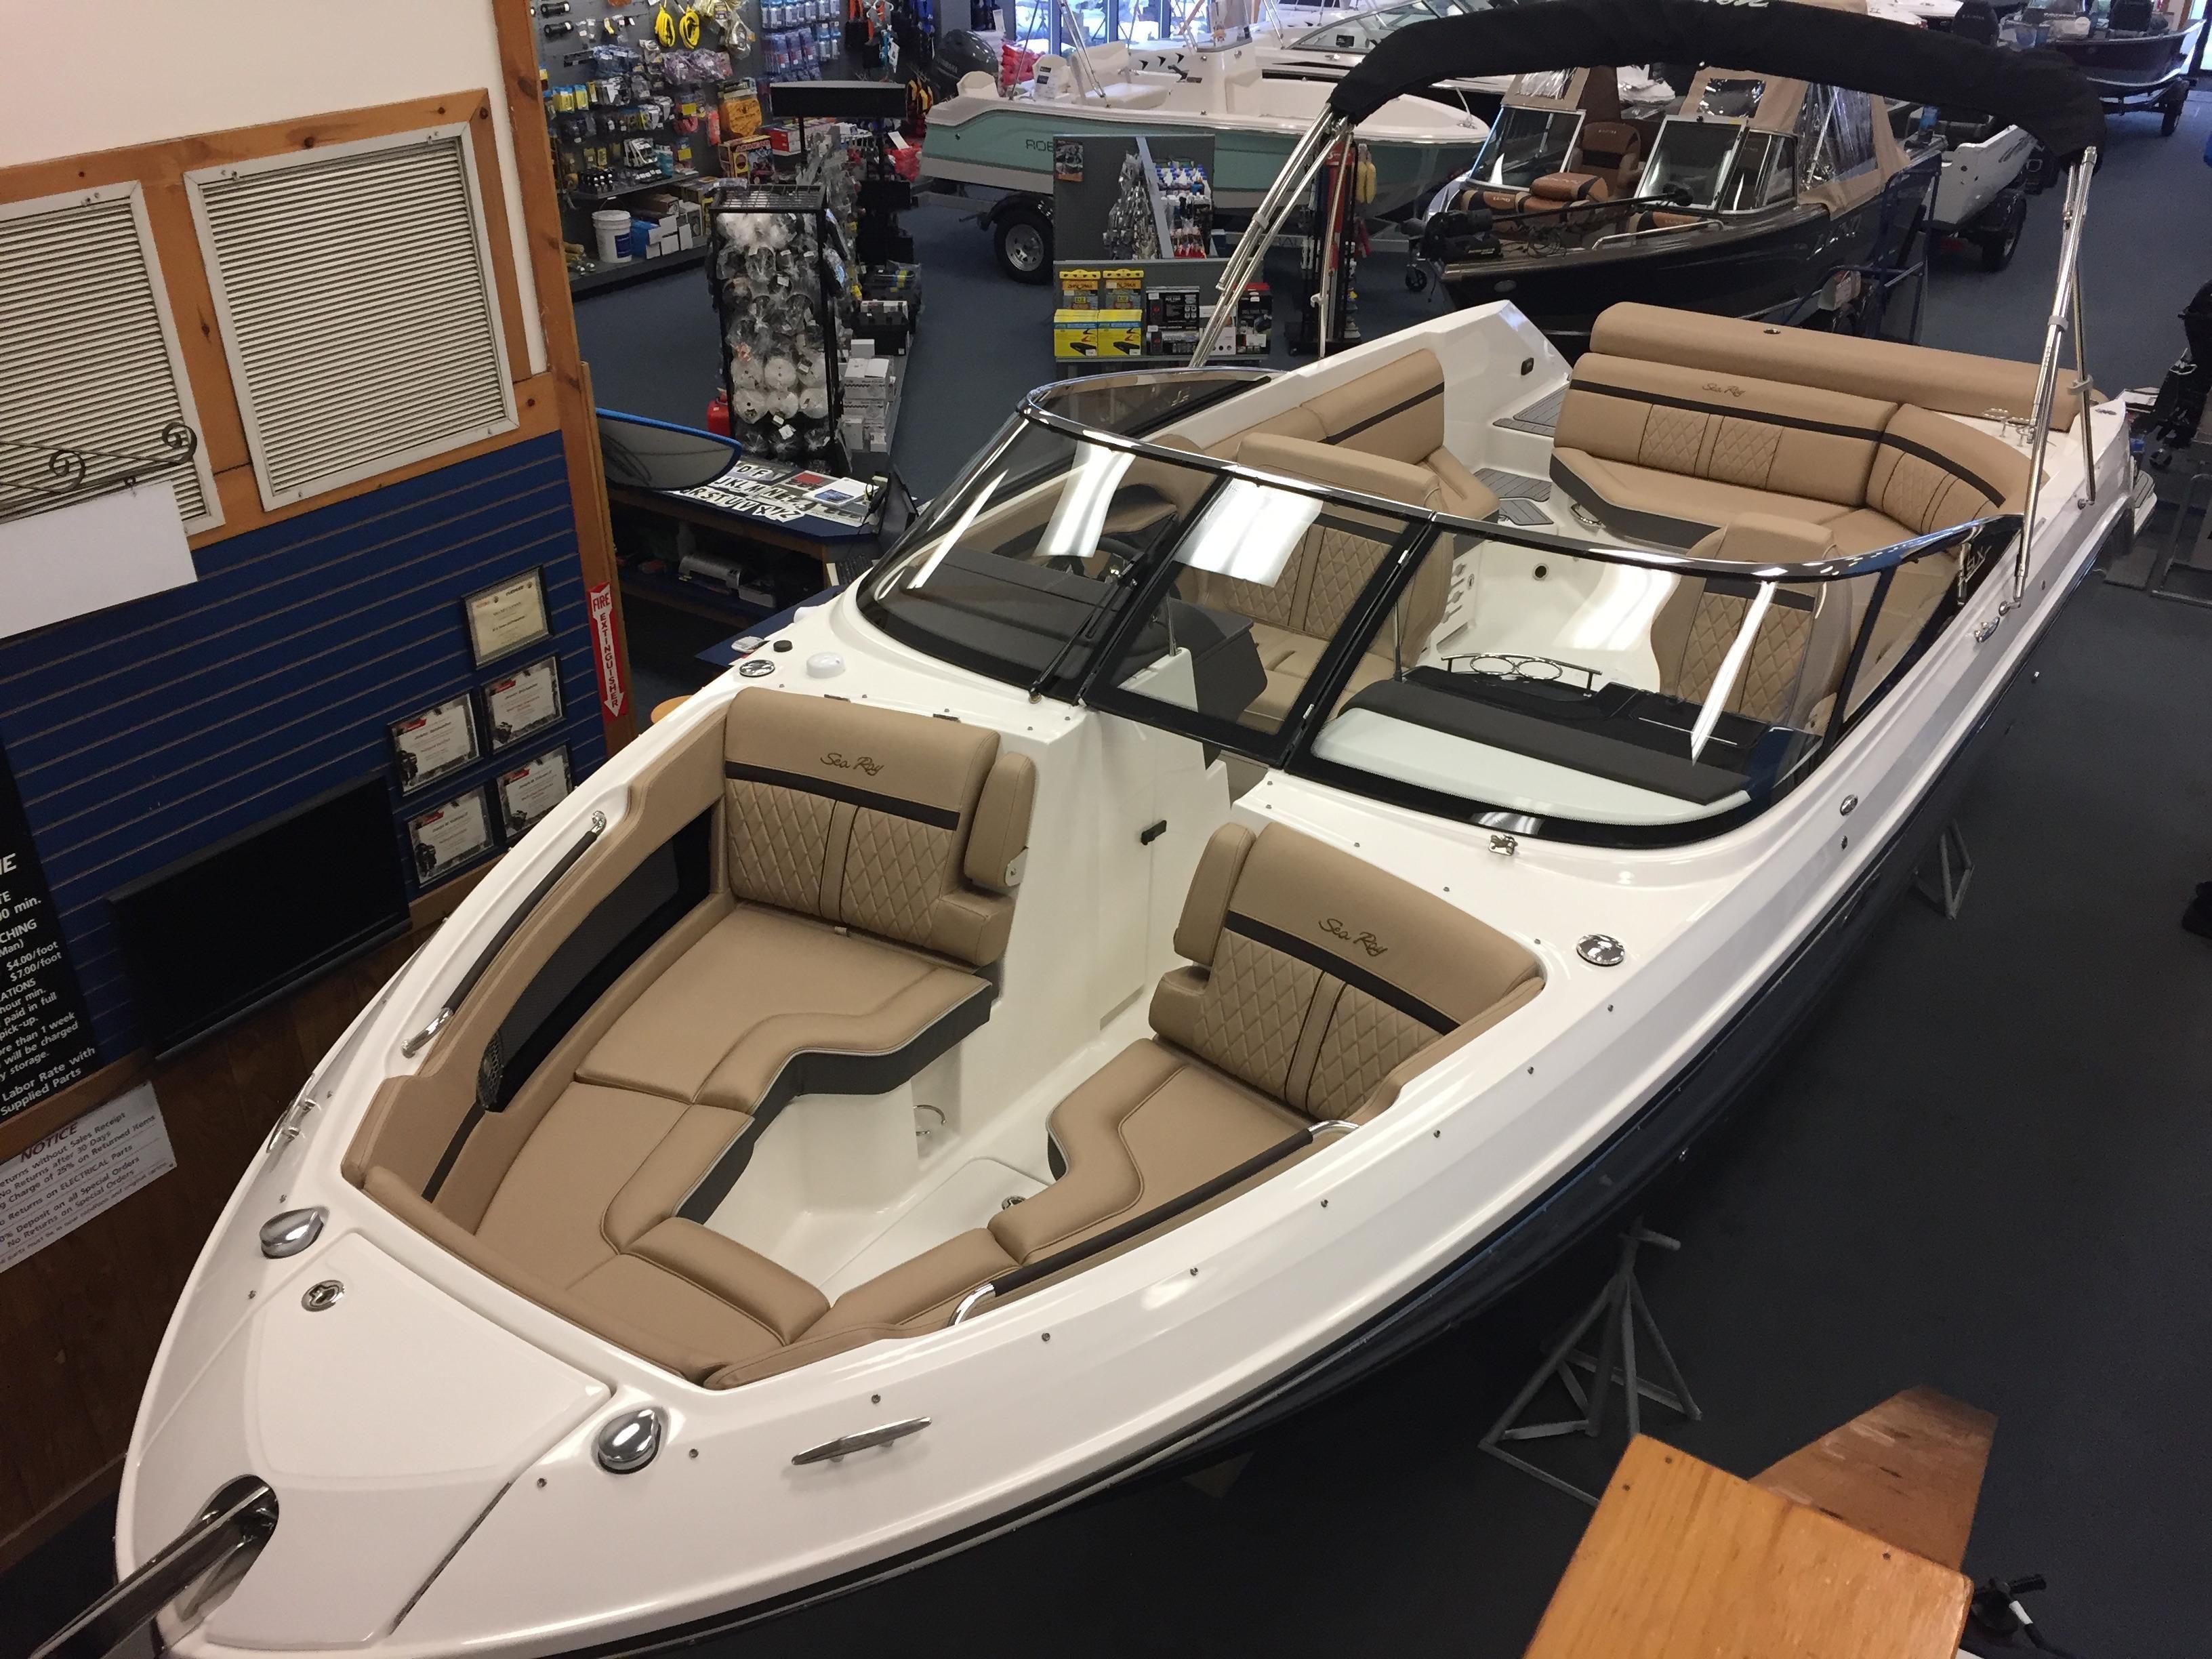 2017 Sea Ray 280 SLX Motor Båt til salgs - no yachtworld com